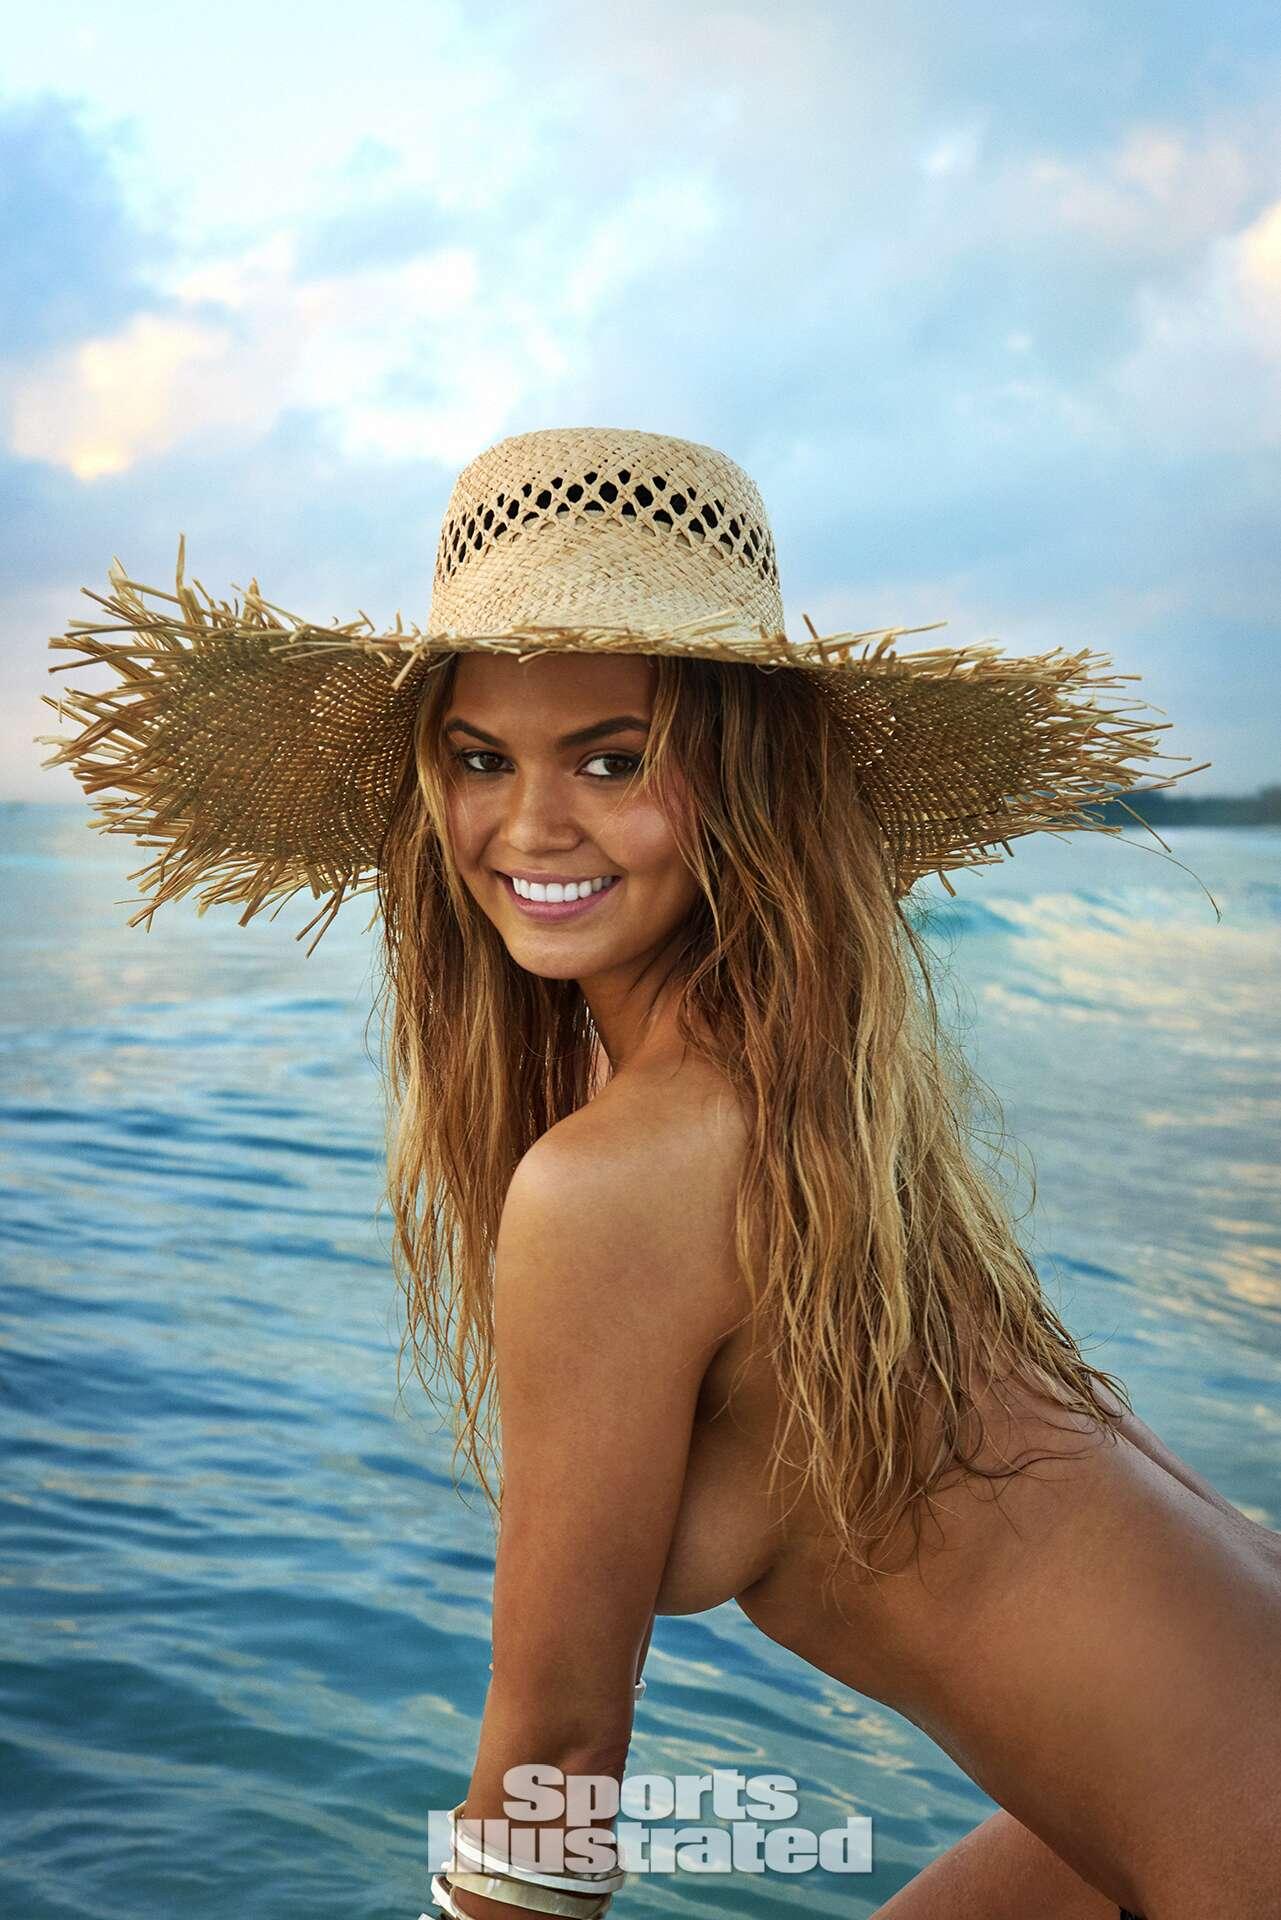 Chrissy Teigen was photographed by Ruven Afanador in Zanzibar. Swimsuit by INDAH.